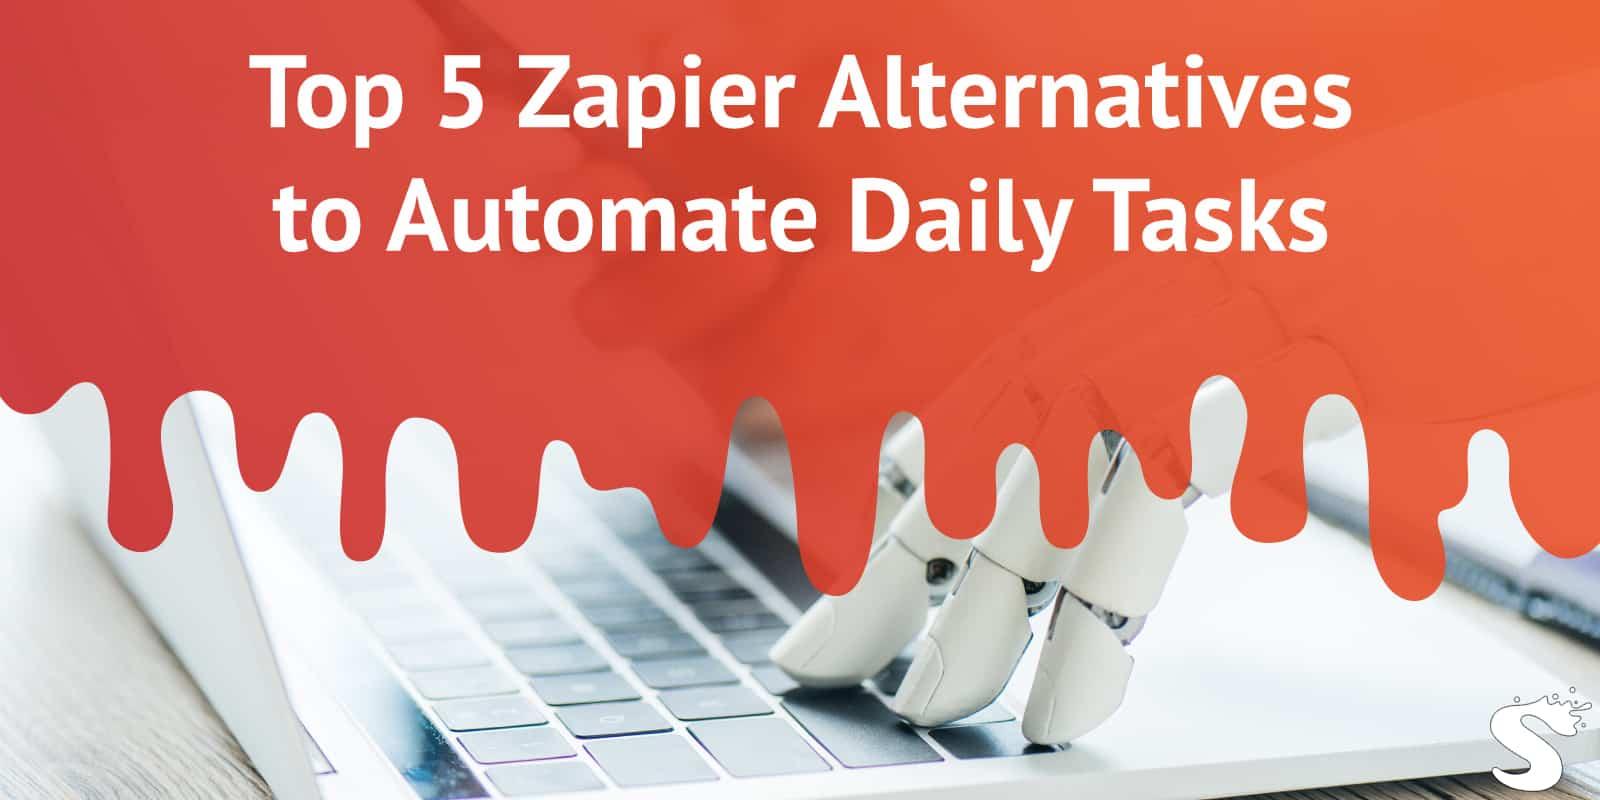 Top 5 Zapier Alternatives